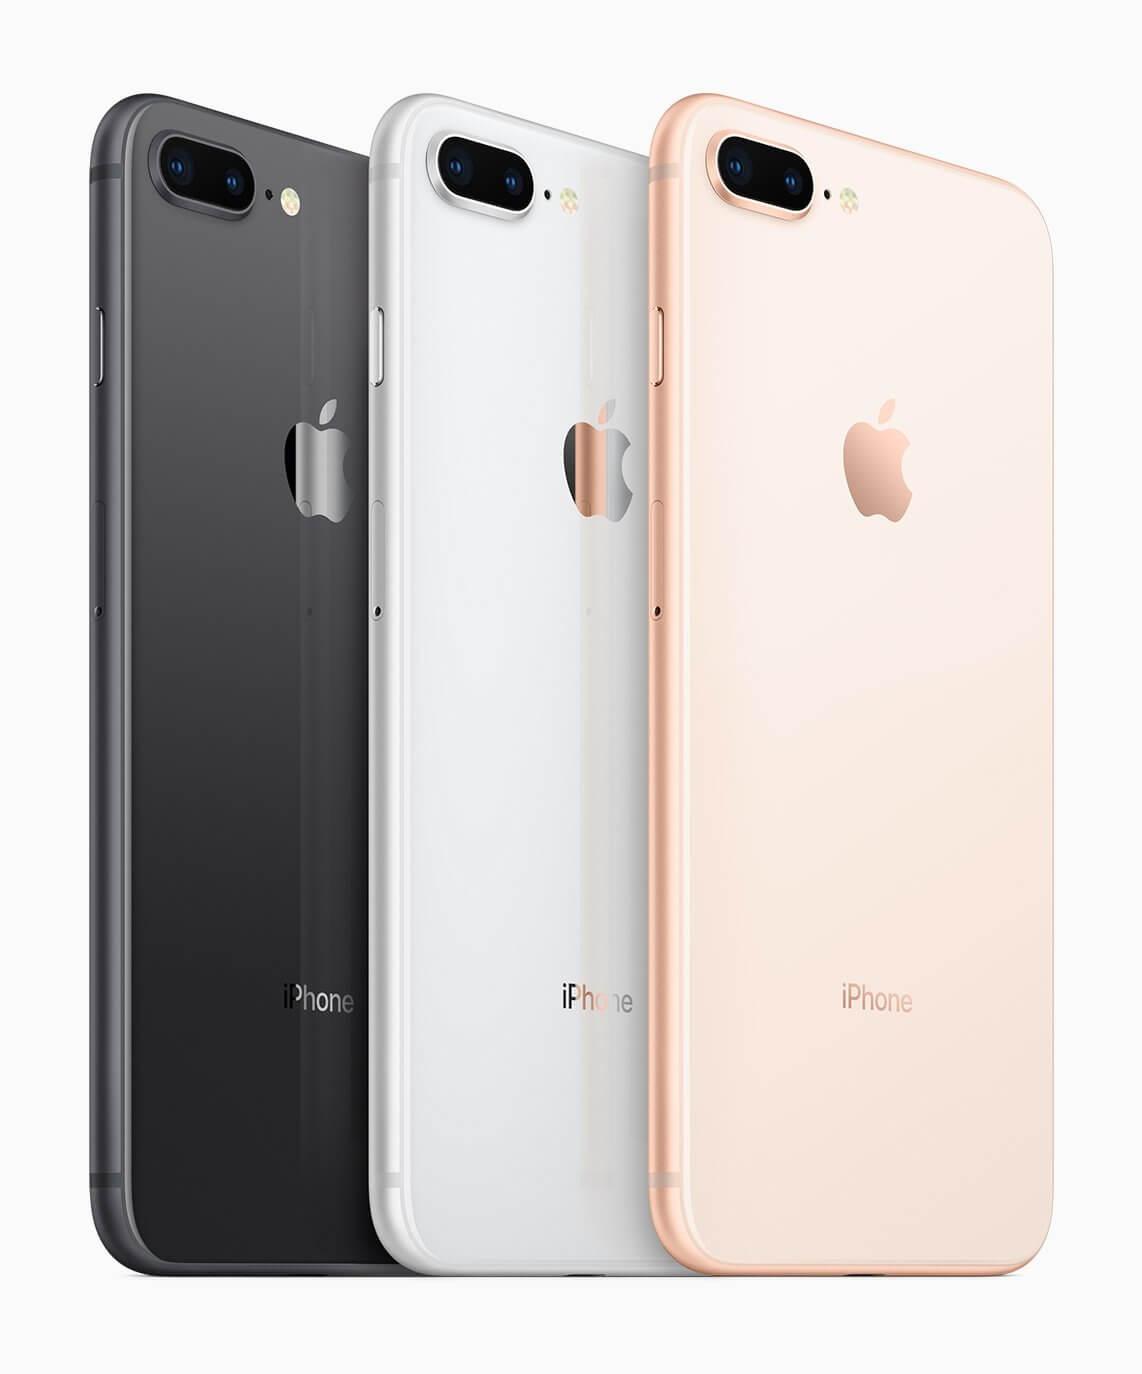 iPhoene 8 - Apple Presse 2